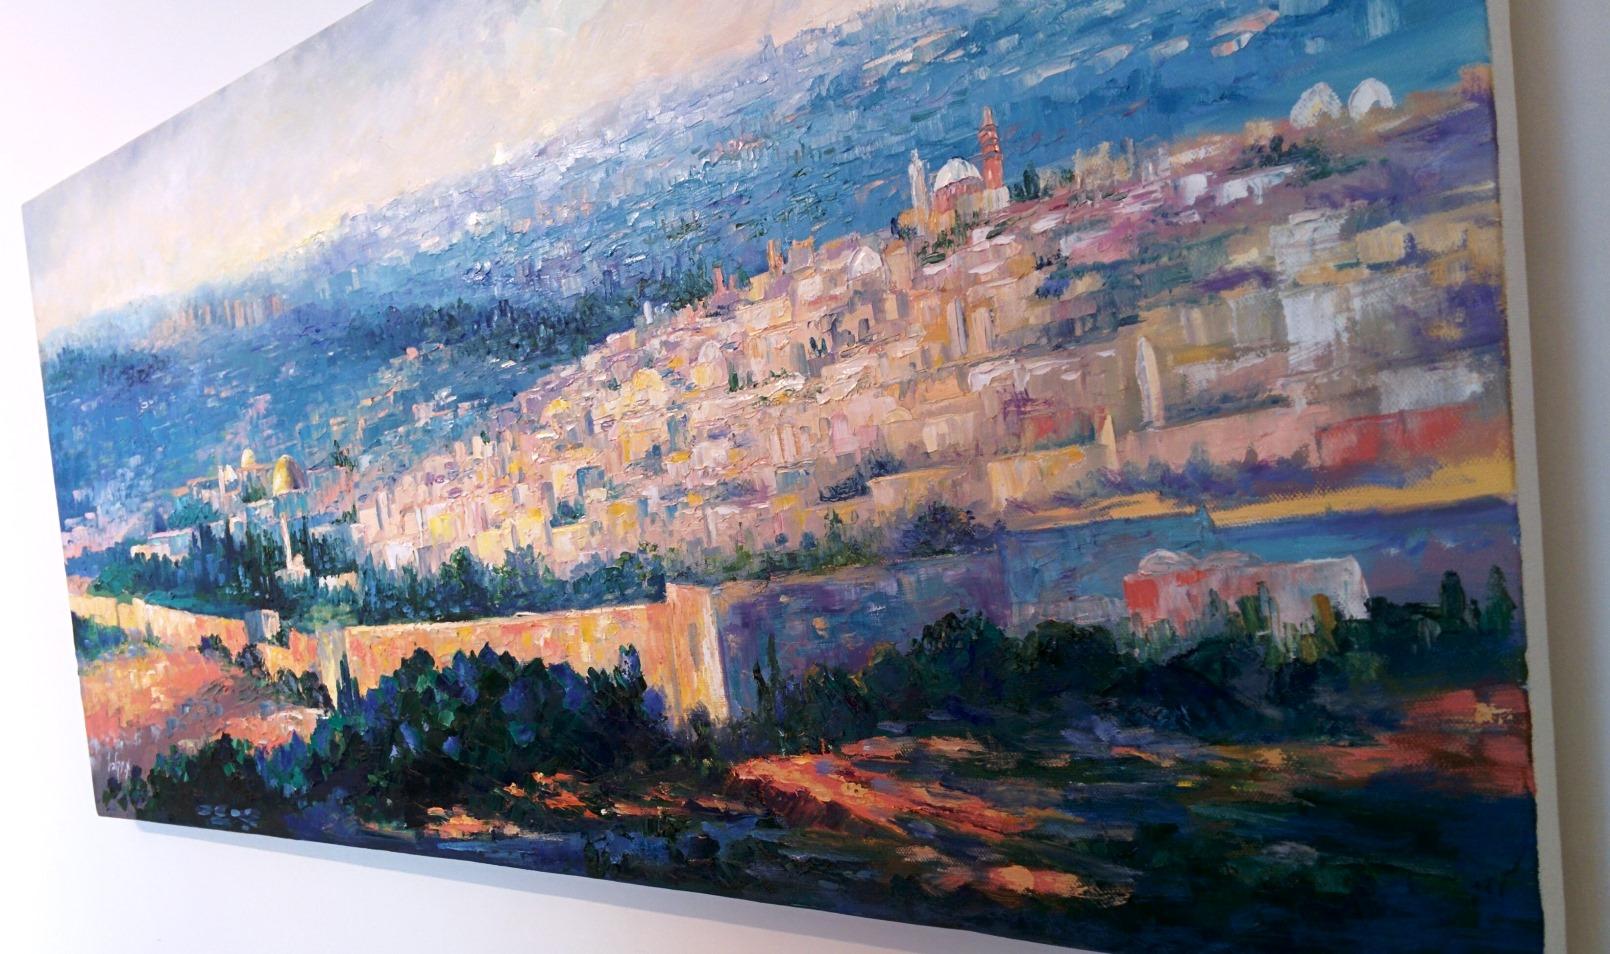 One of Menucha Yankelevitch's interpretations of the view. Photo by Abigail Klein Leichman